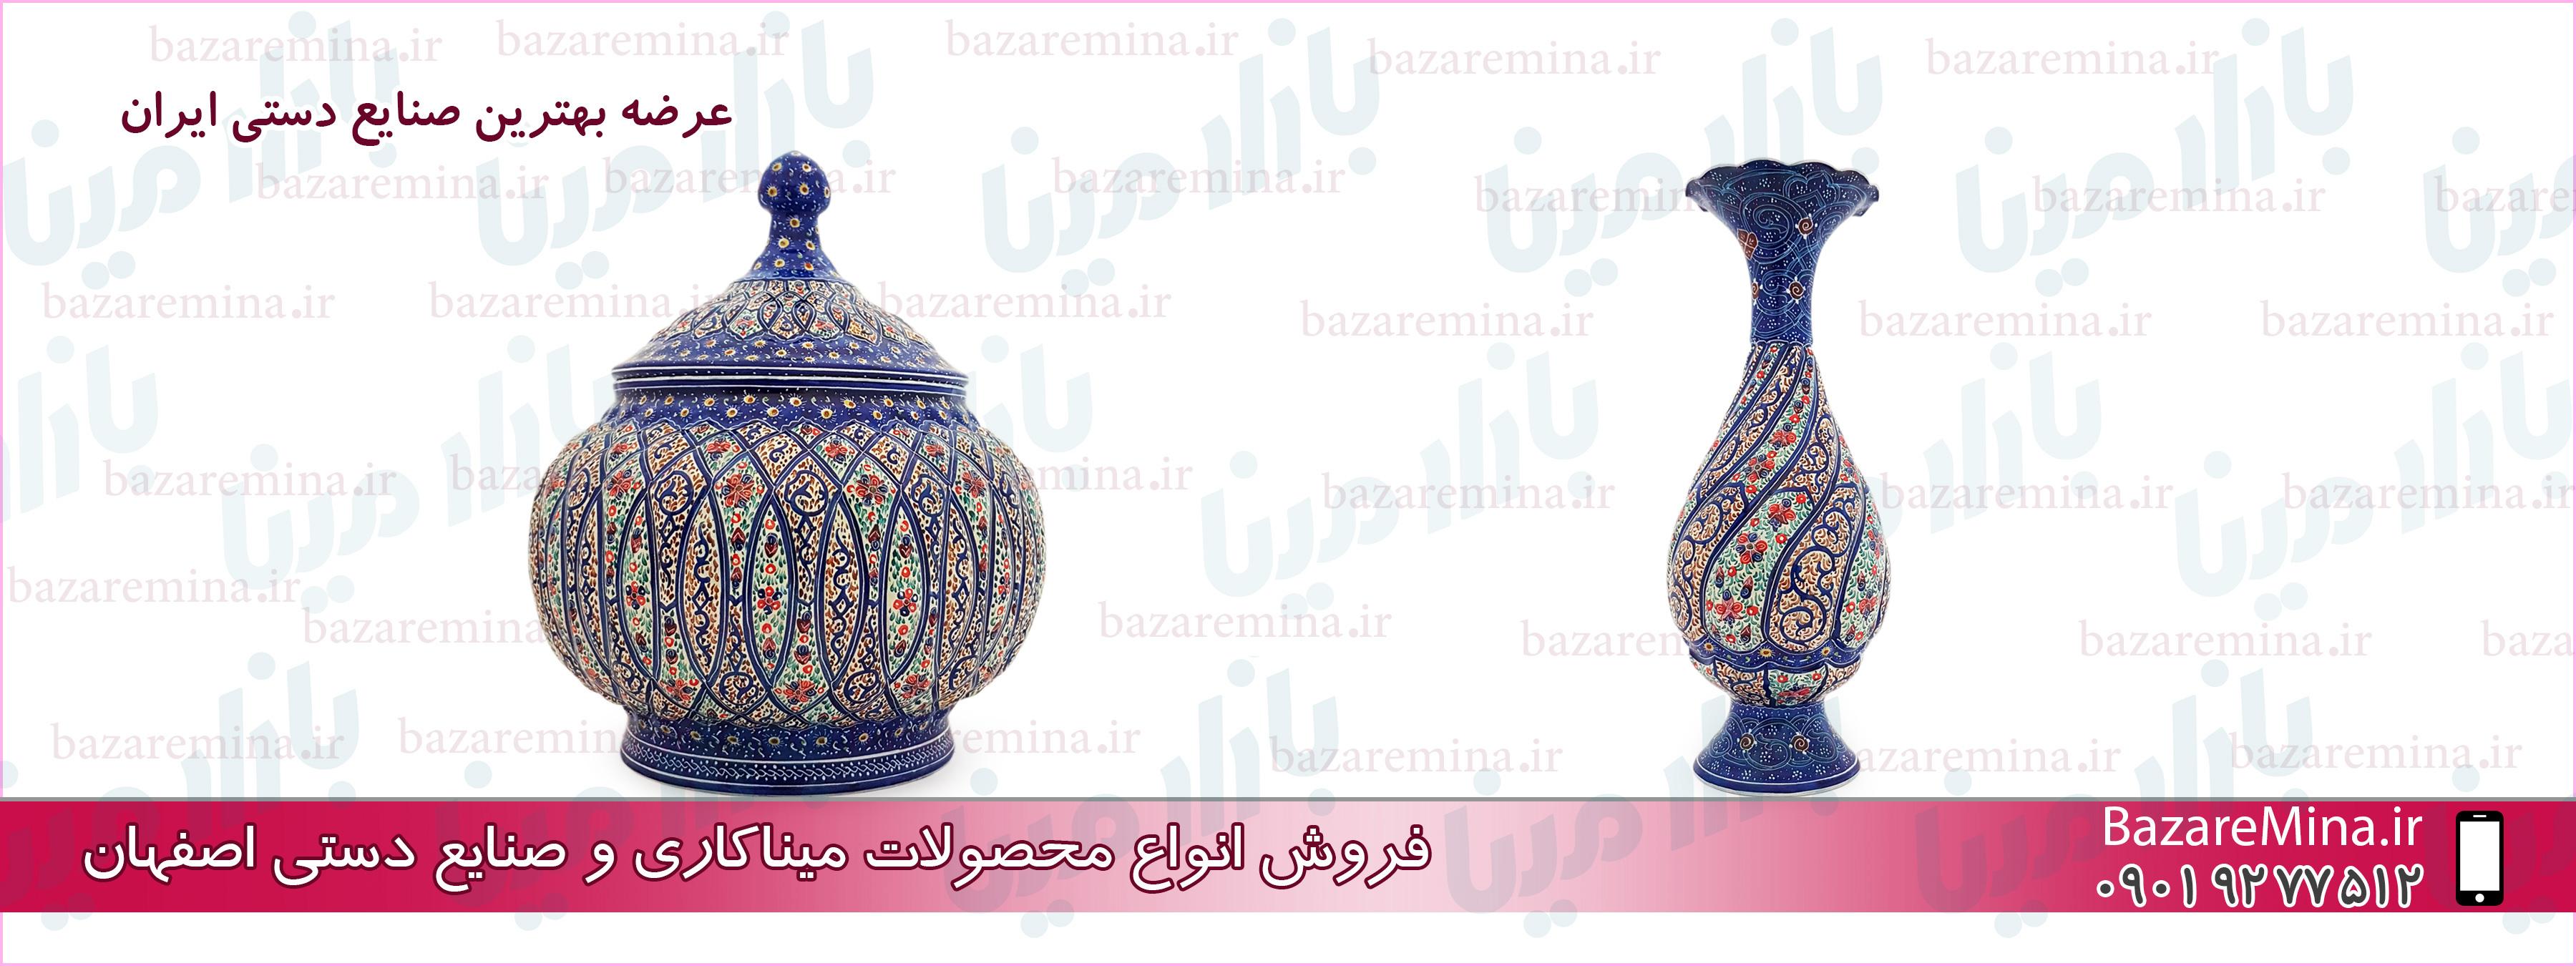 میناکاری اصفهان روی مس